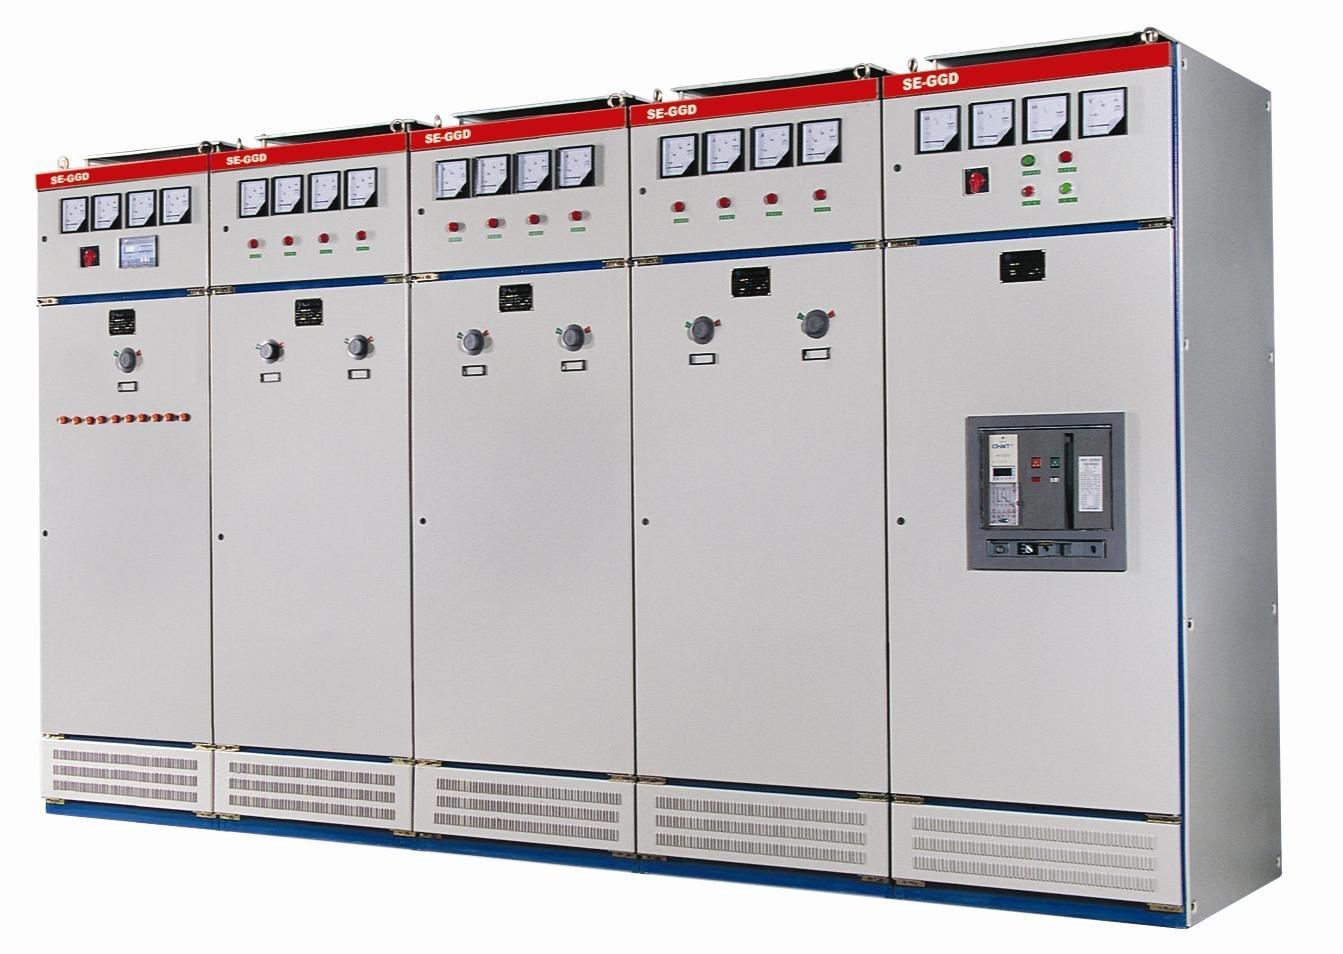 ggd低压配电柜销售价格/哪里买-上开自动化科技有限